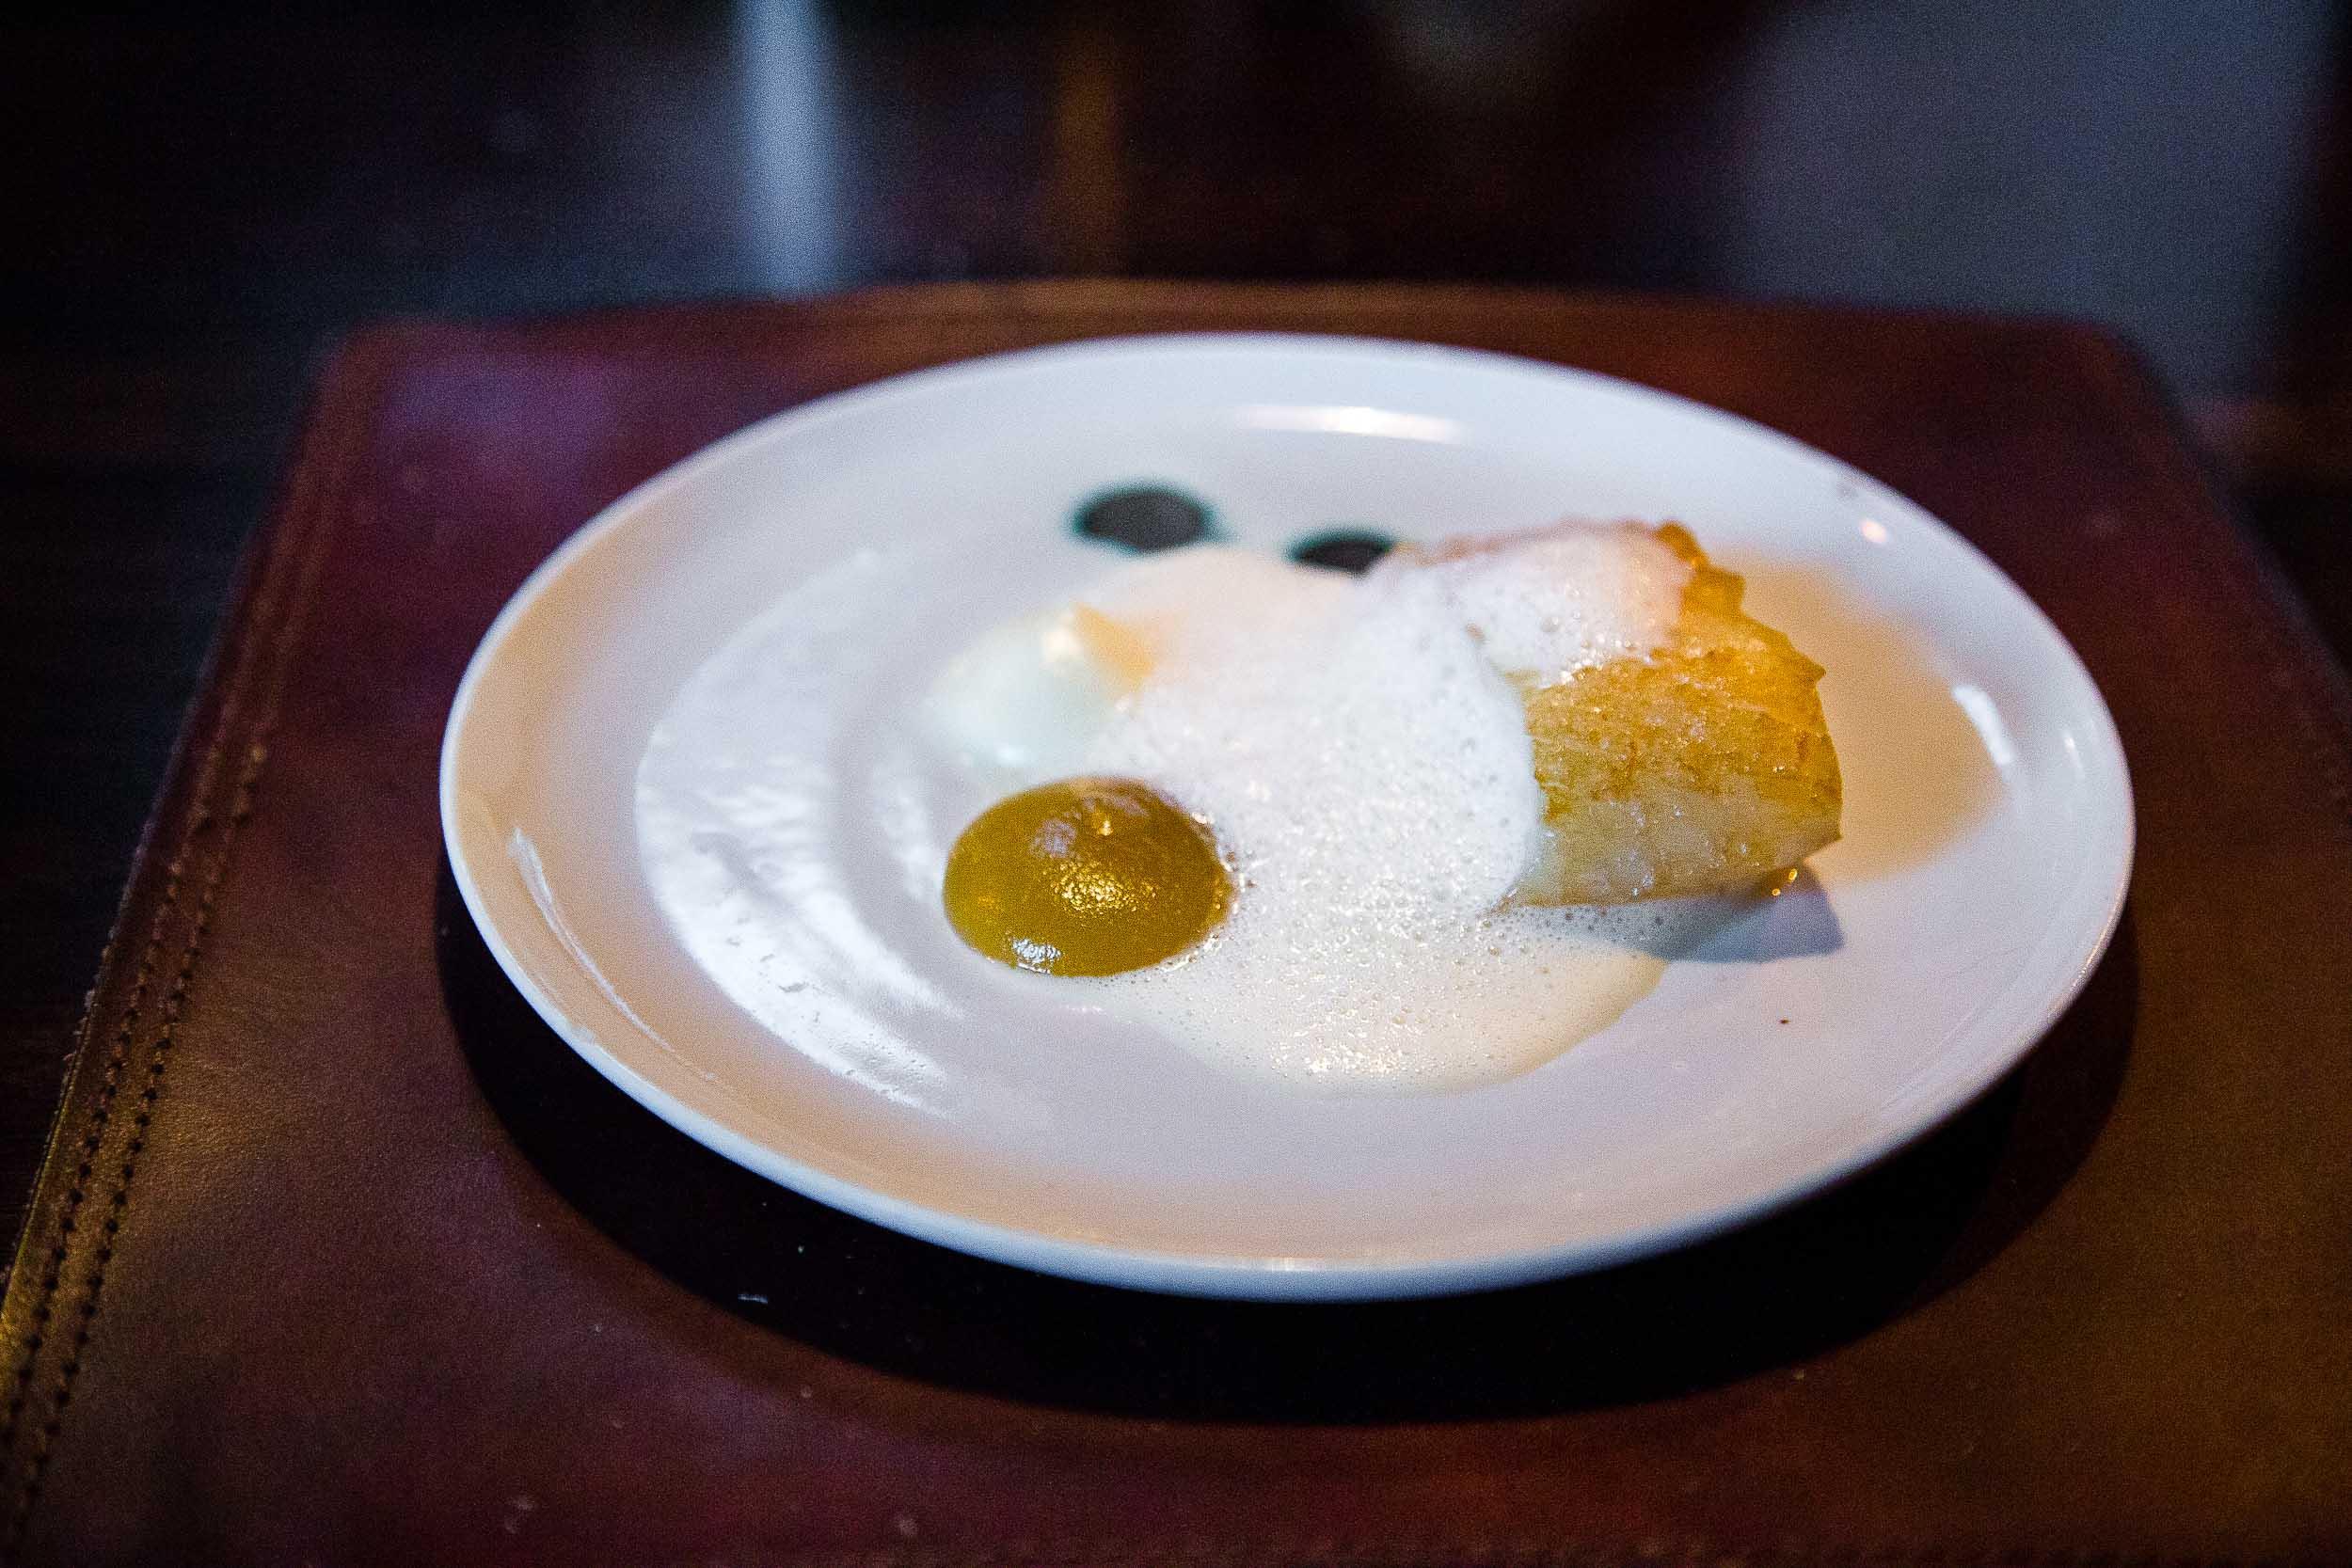 Salted cod, parsnip, apple, fried cod [bones] cream